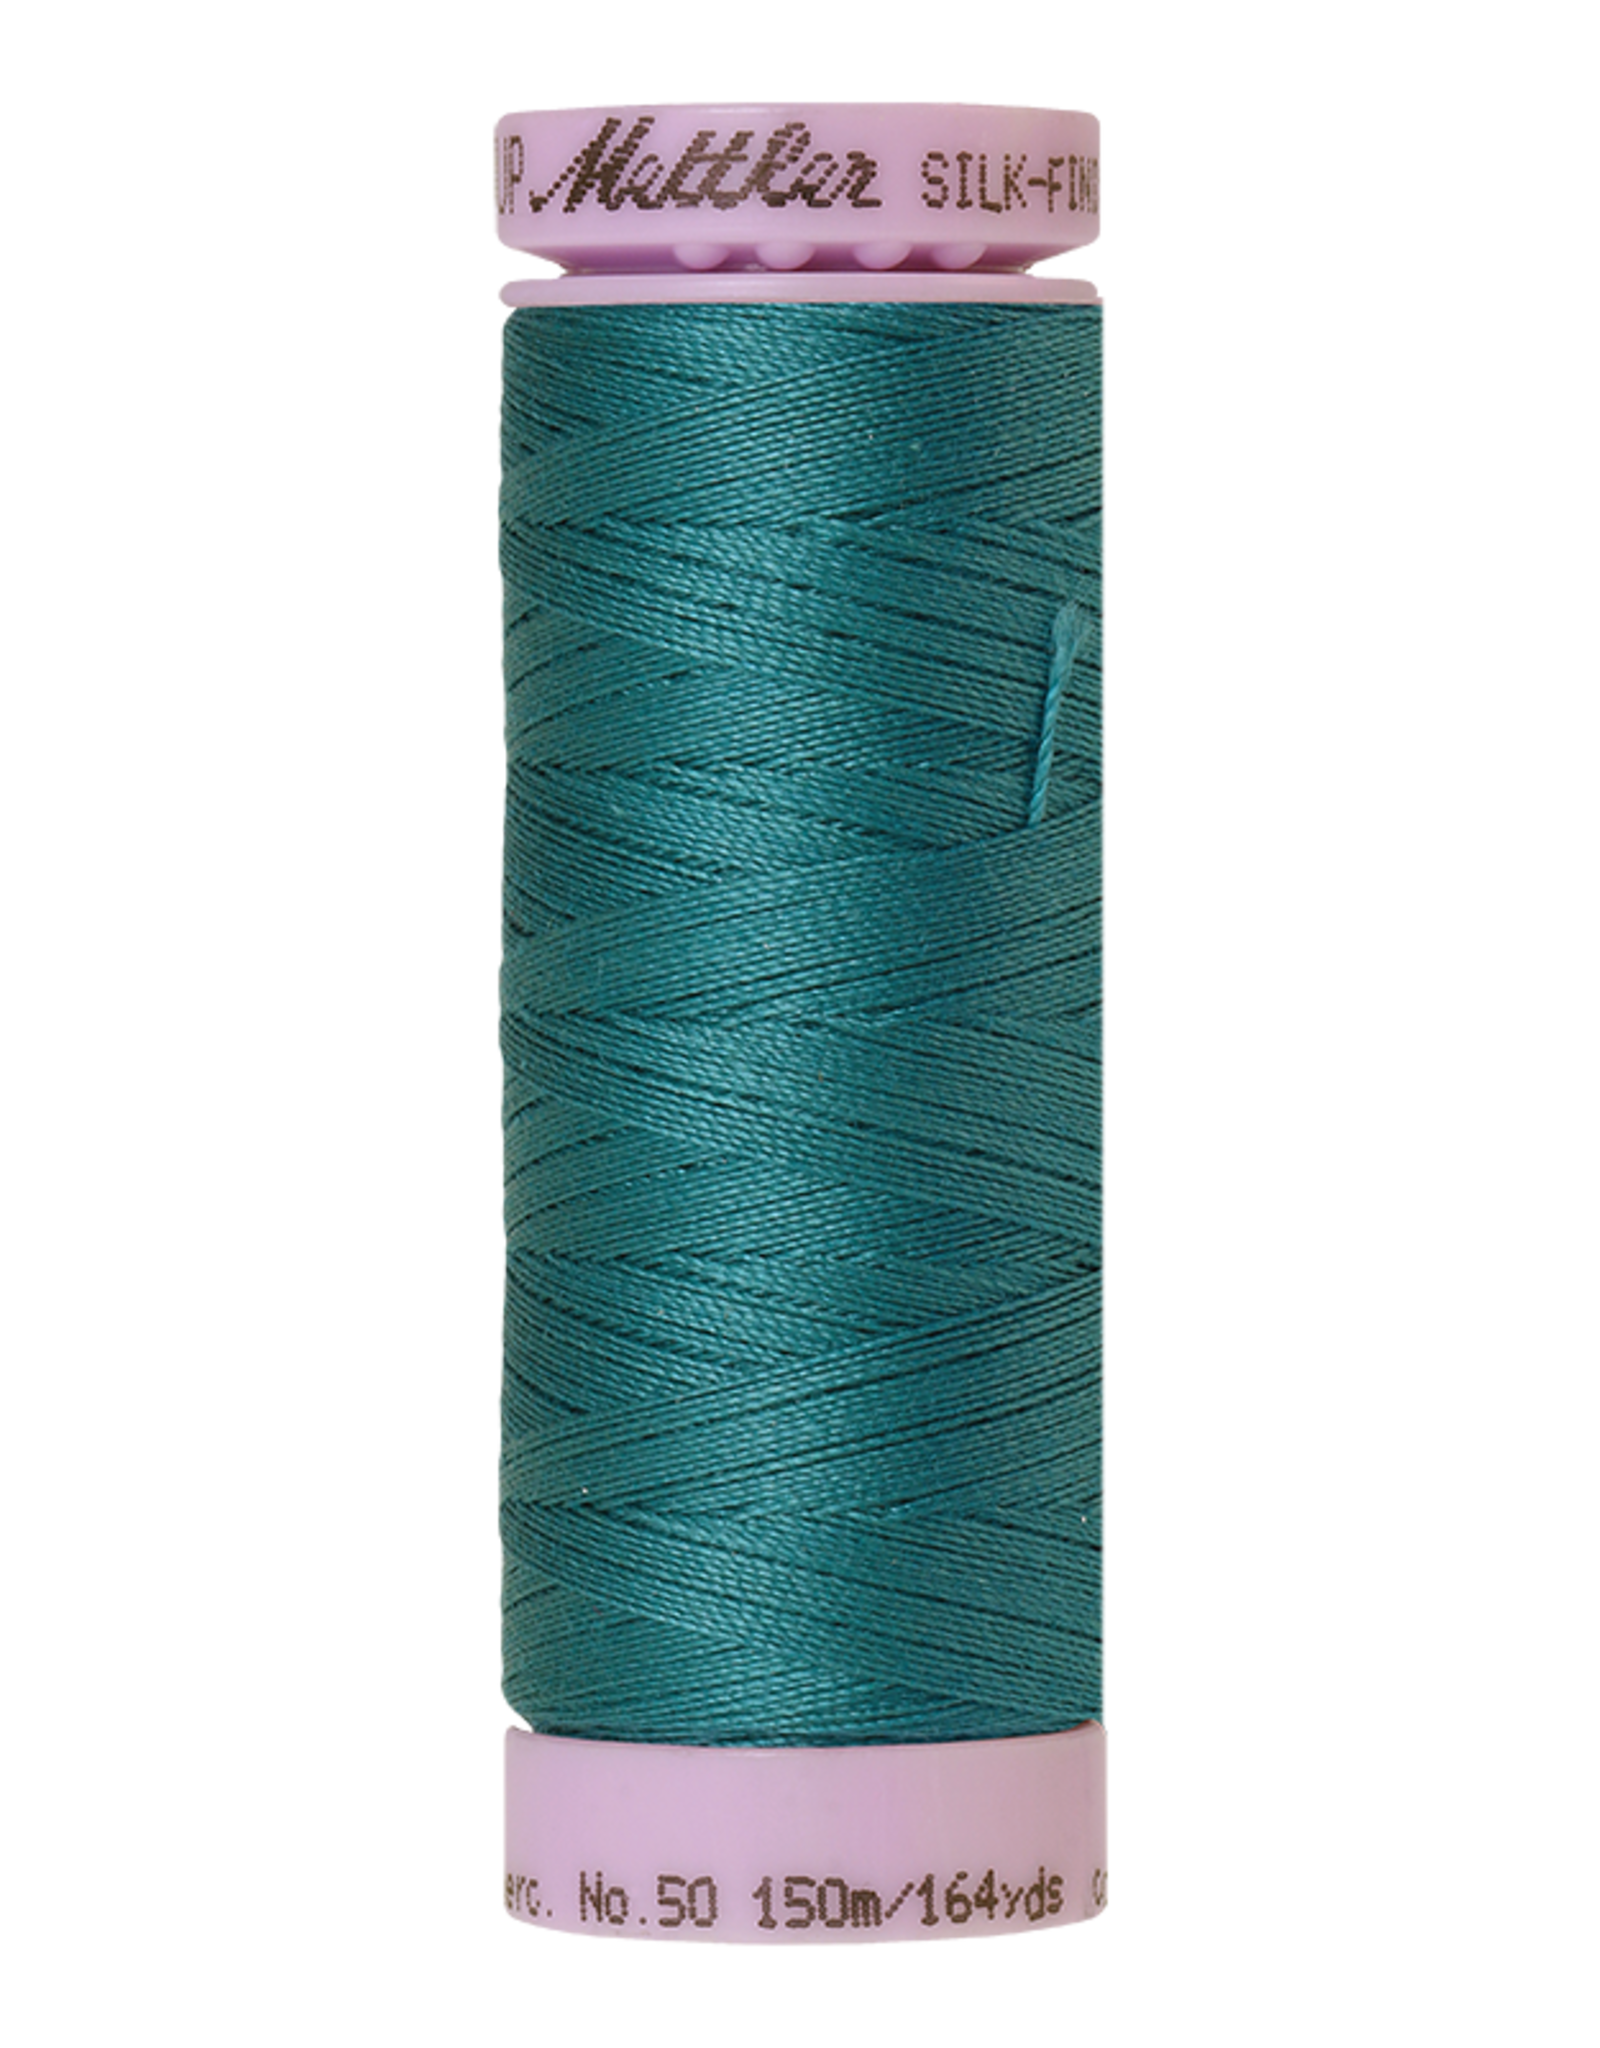 Mettler Silk Finish Cotton 50 - 150 meter - 1472